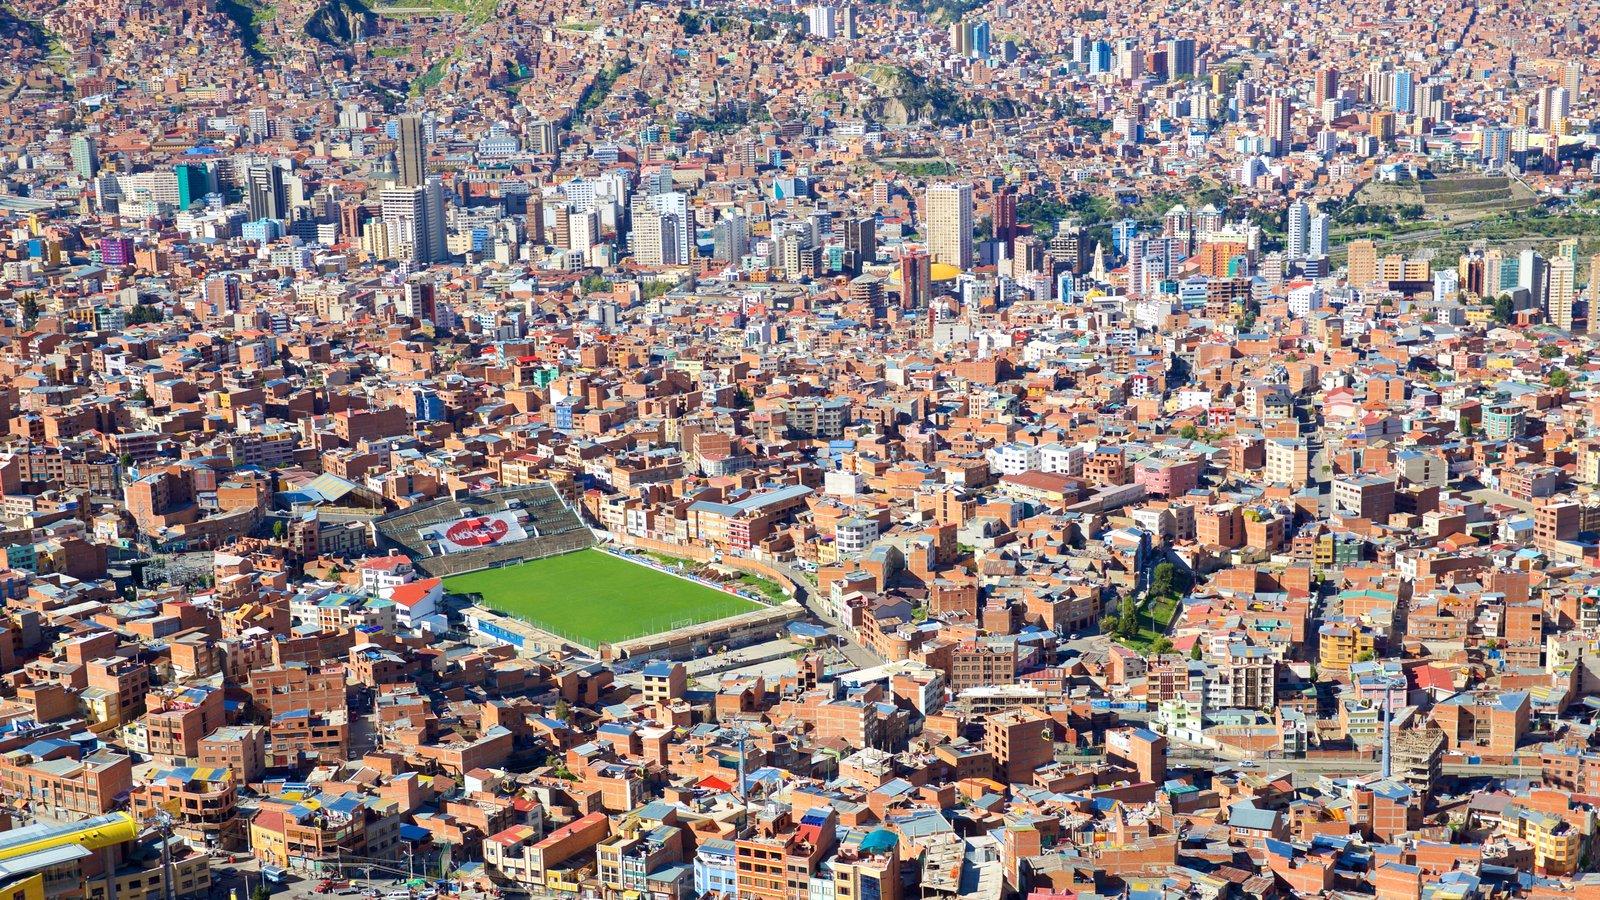 La Paz caracterizando uma cidade